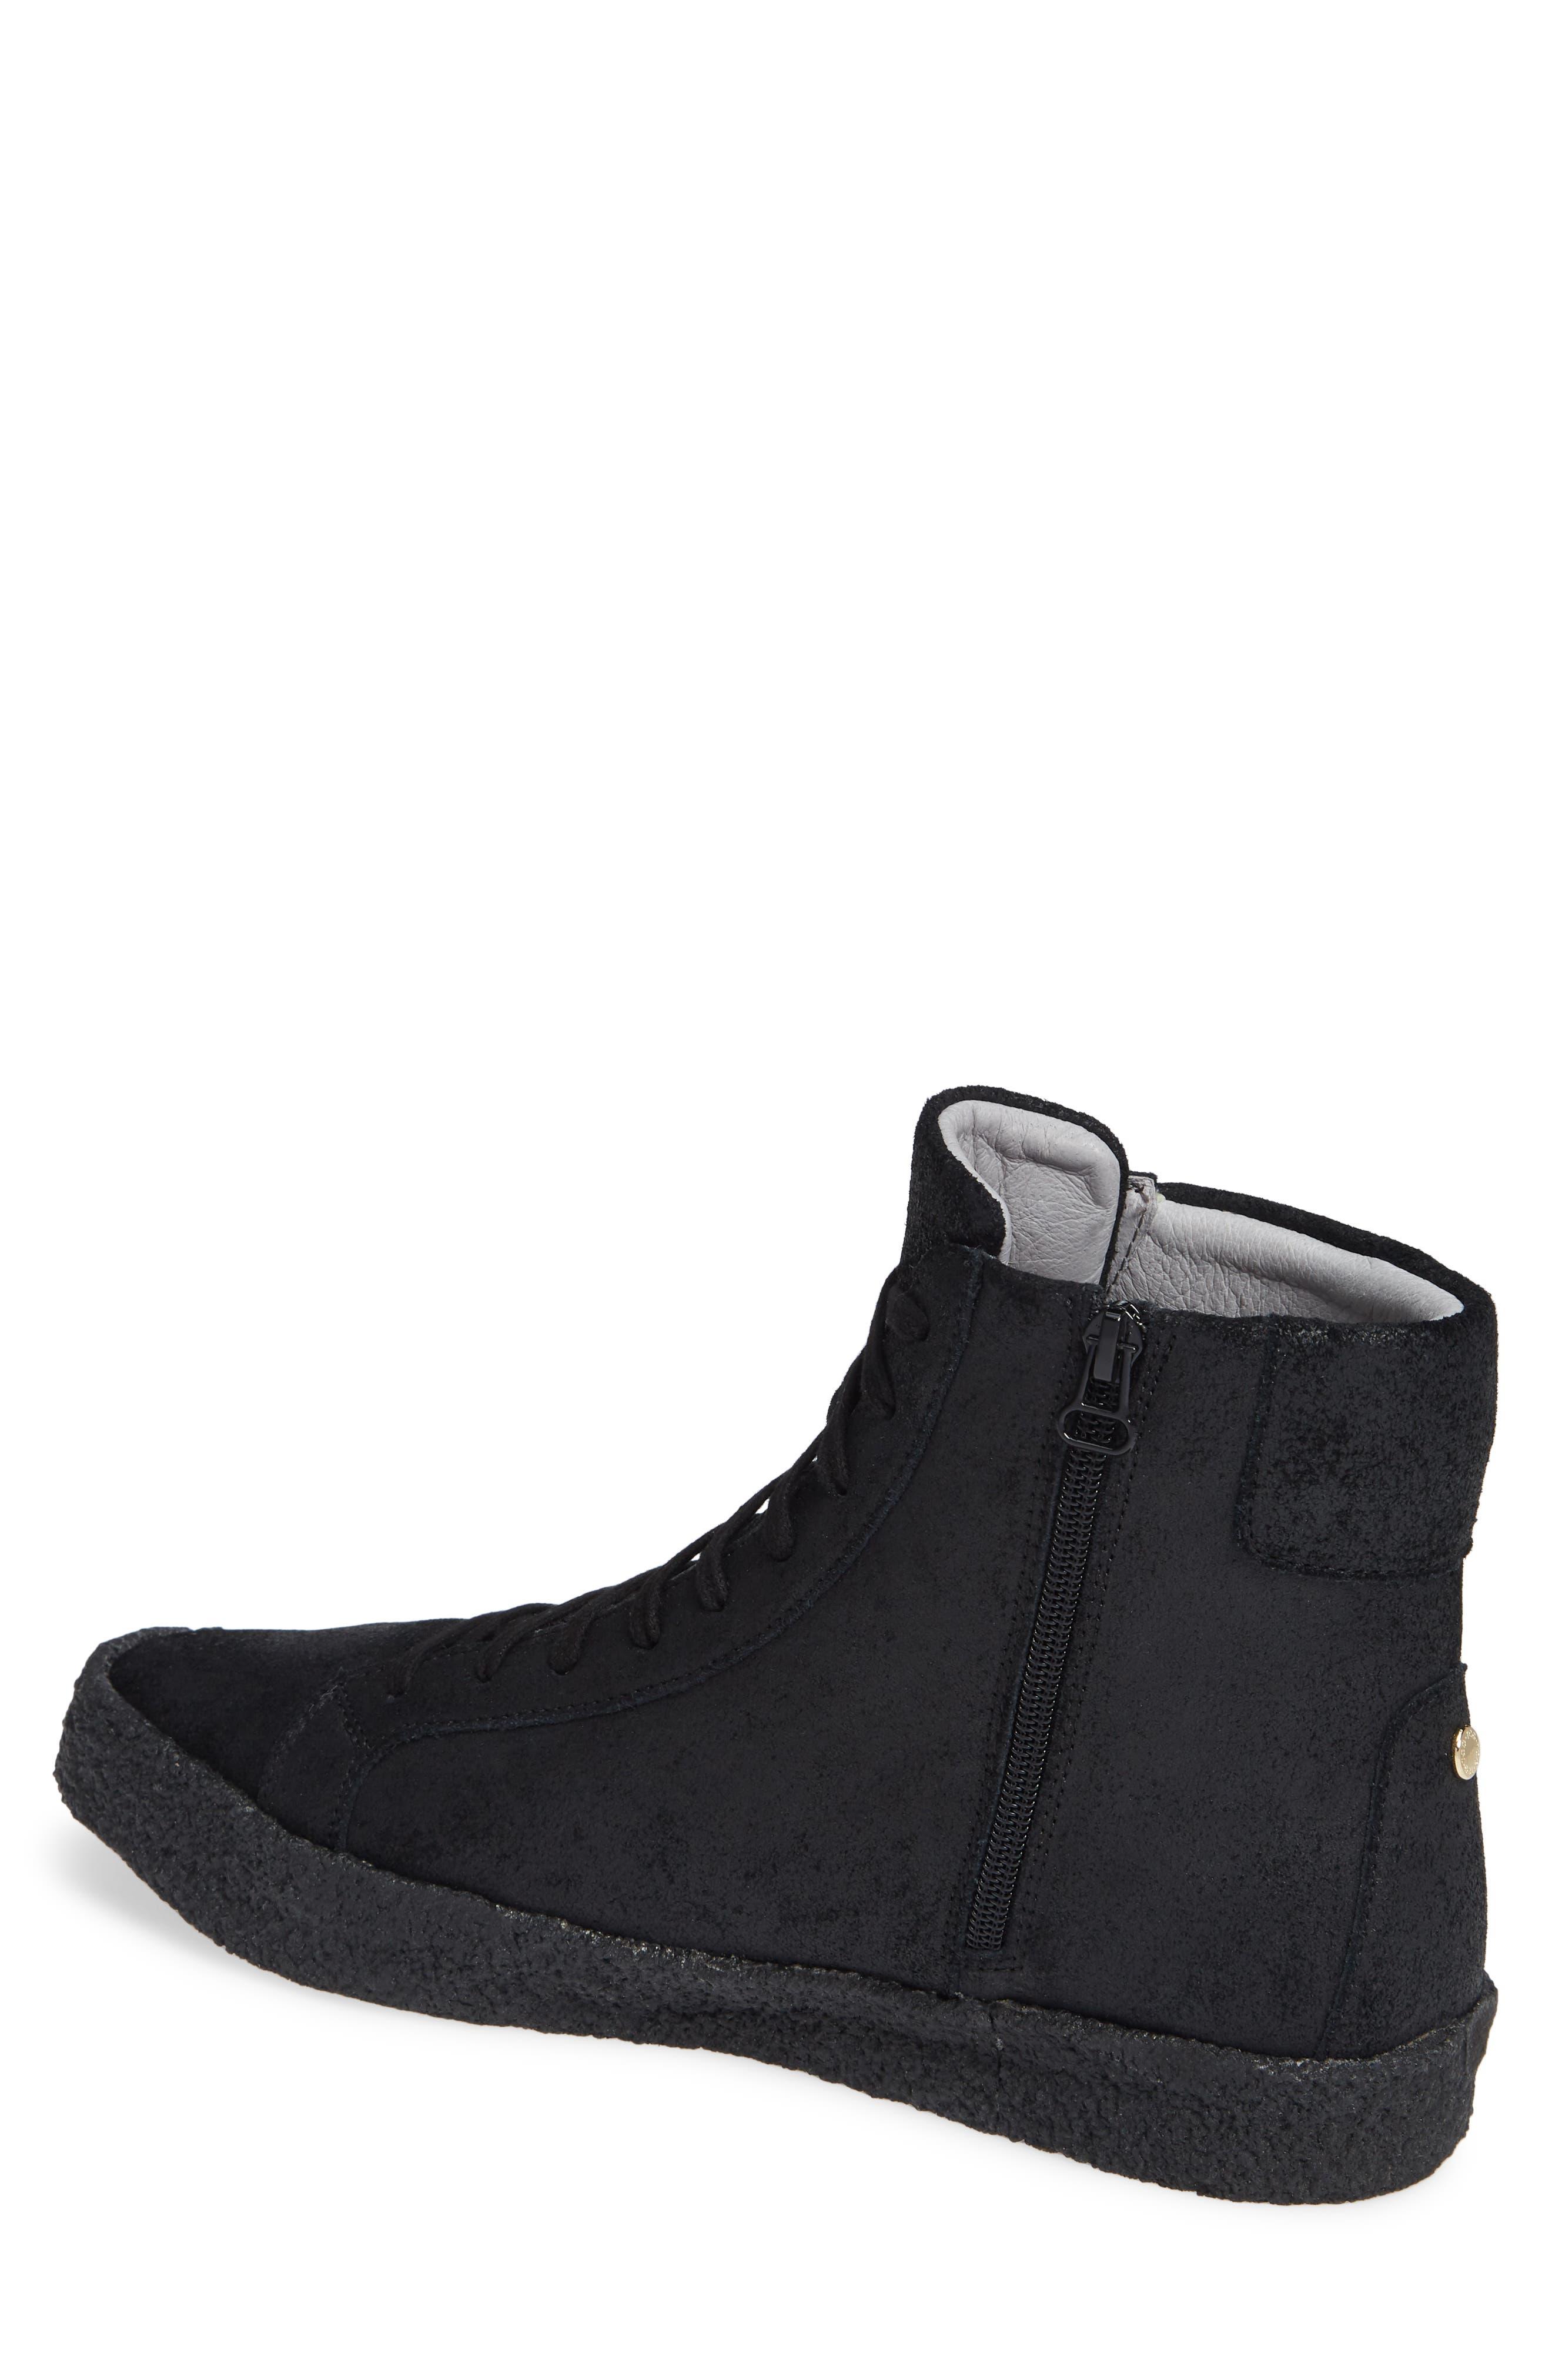 Apa High Top Sneaker,                             Alternate thumbnail 2, color,                             TRIPLE BLACK LEATHER